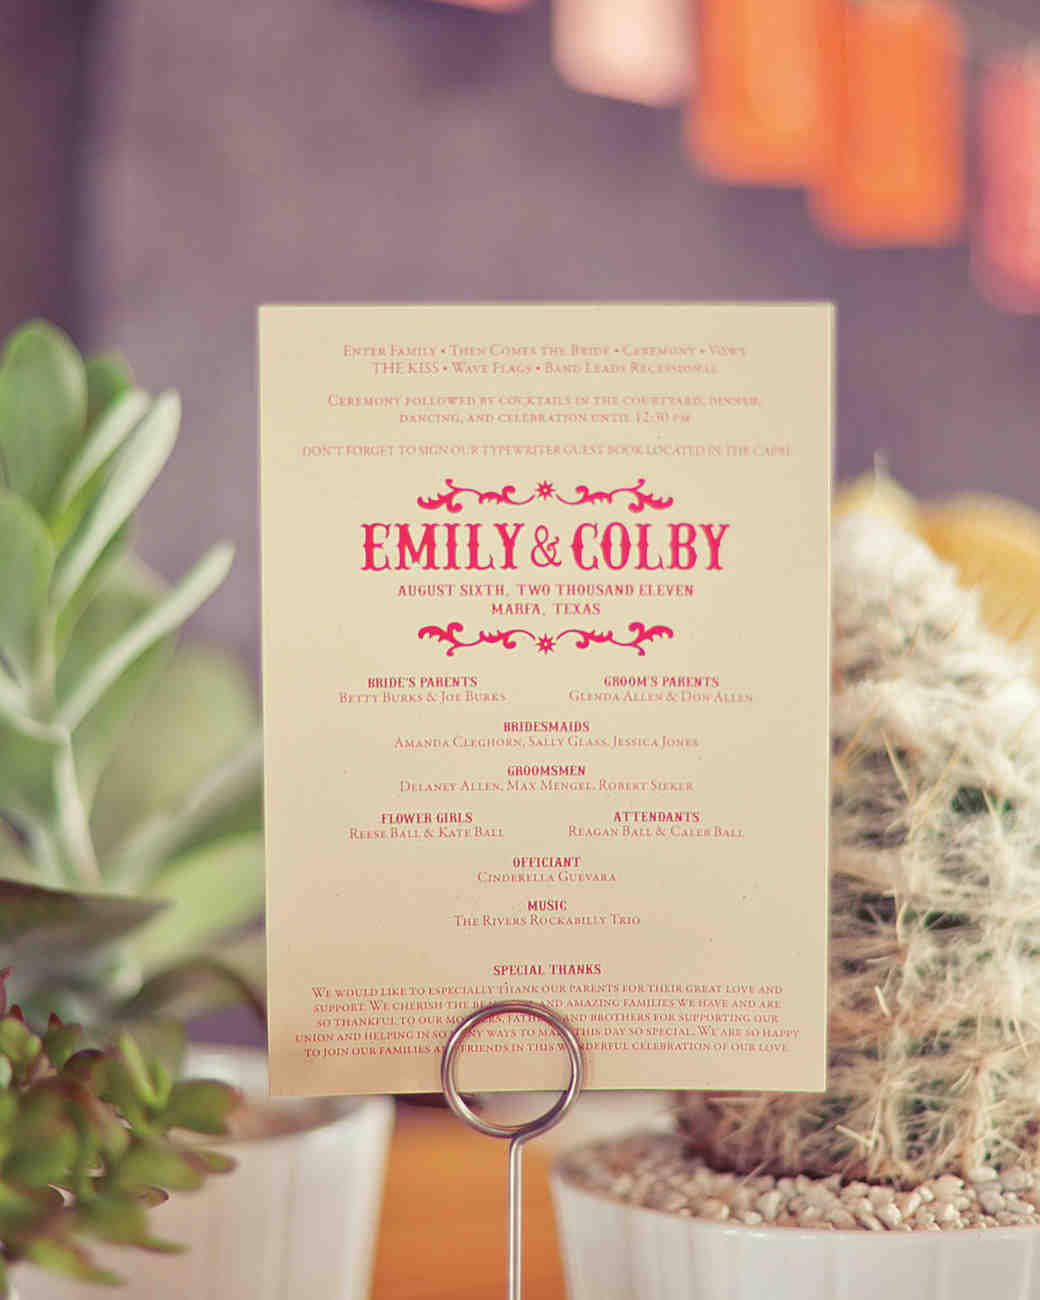 emily-colby-mwds108257-6956.jpg